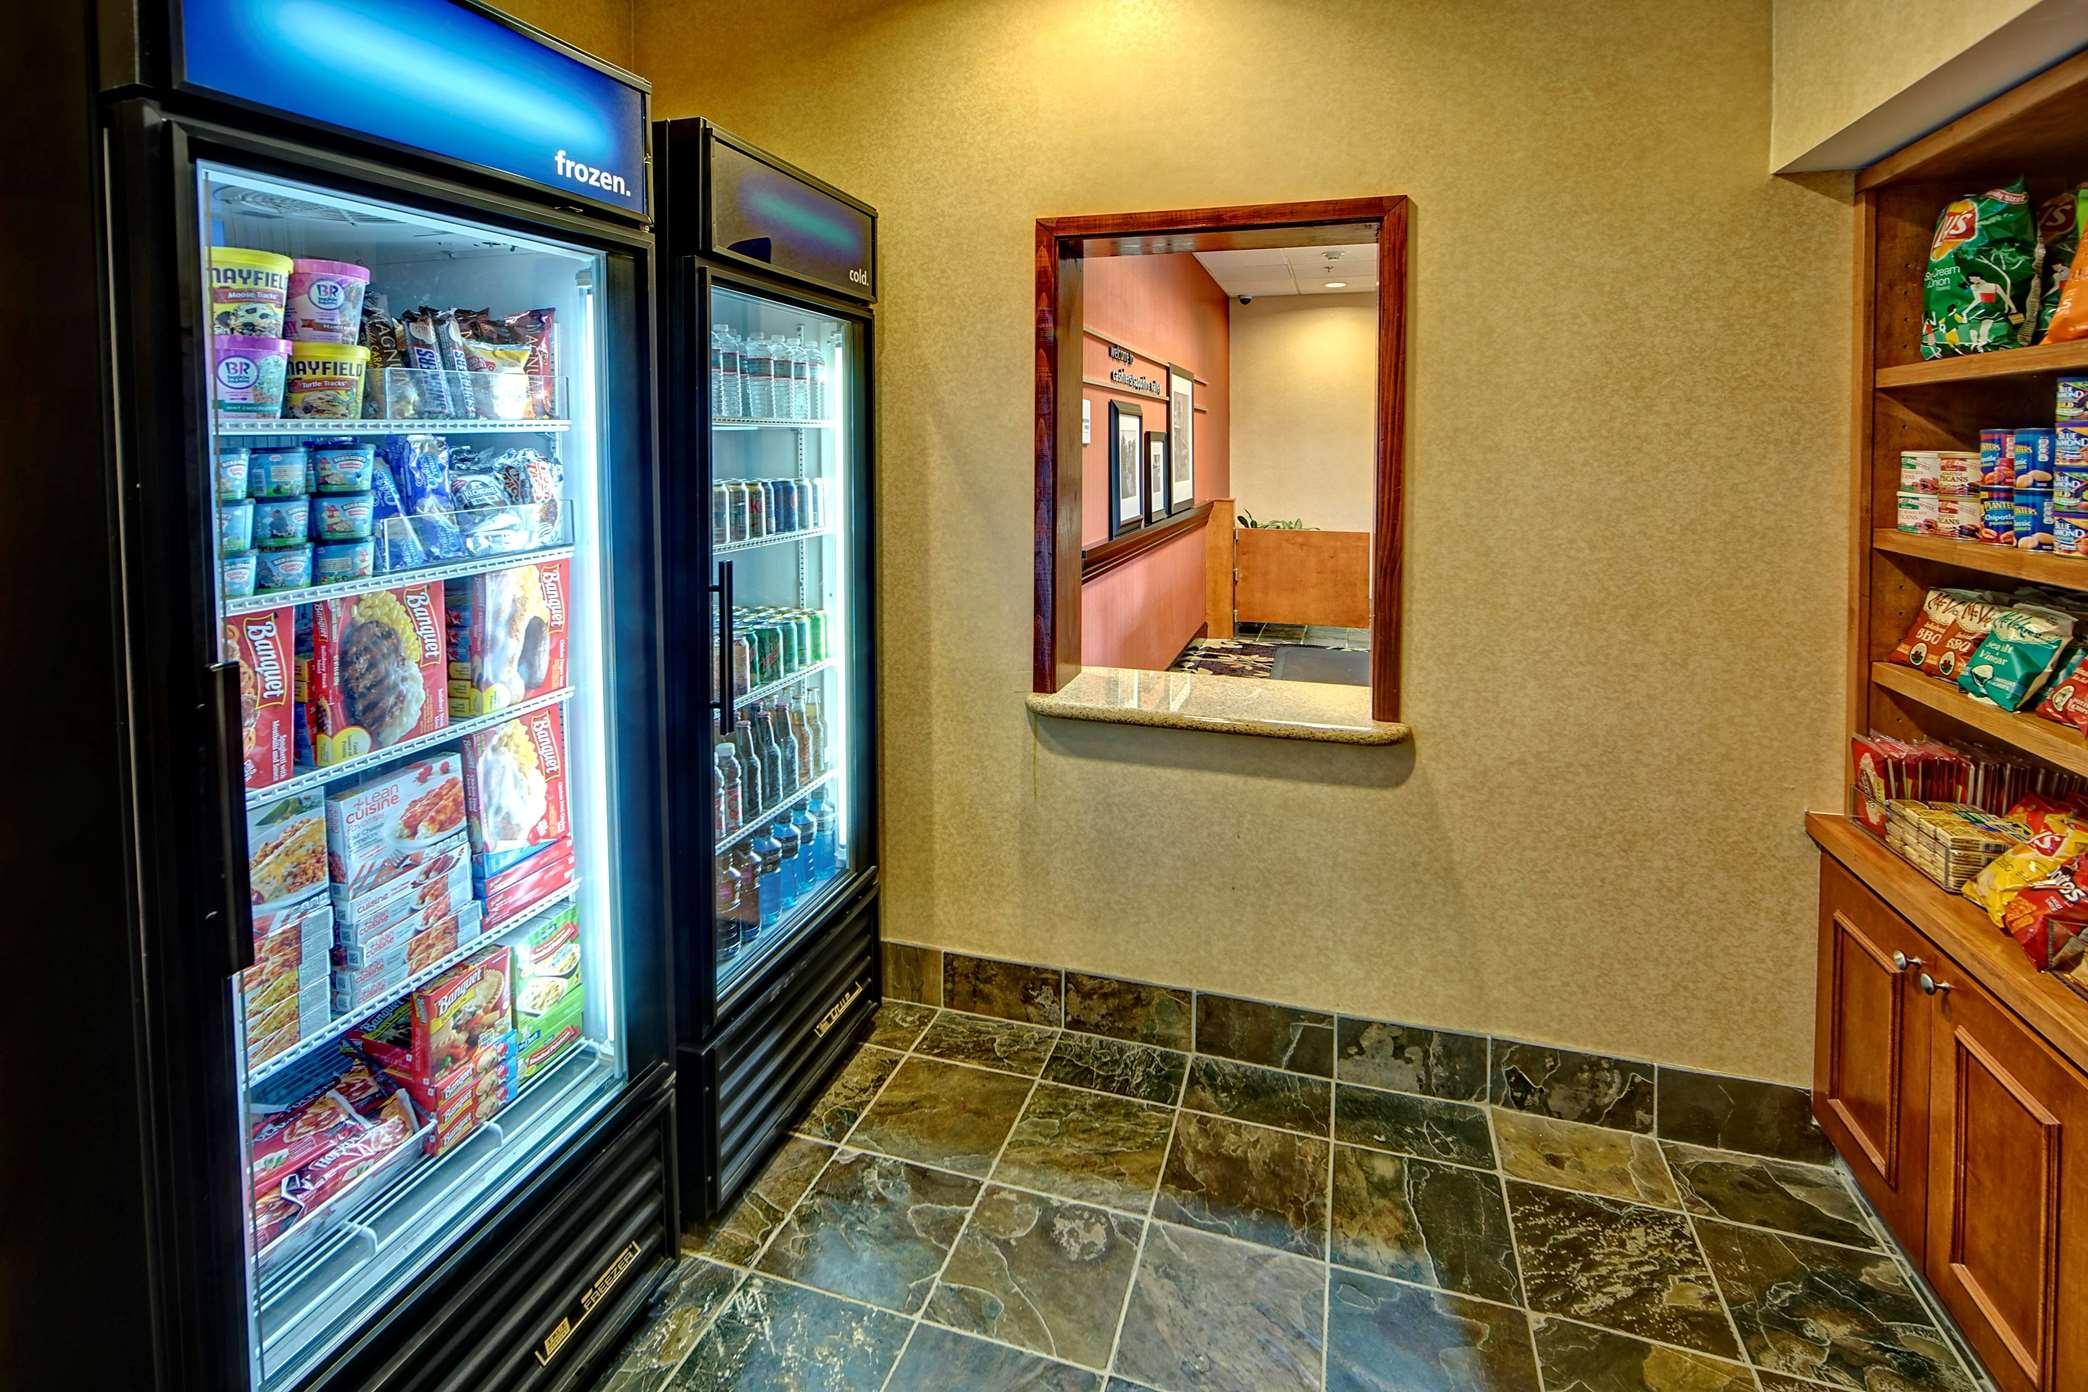 Hampton Inn & Suites Cashiers-Sapphire Valley image 32